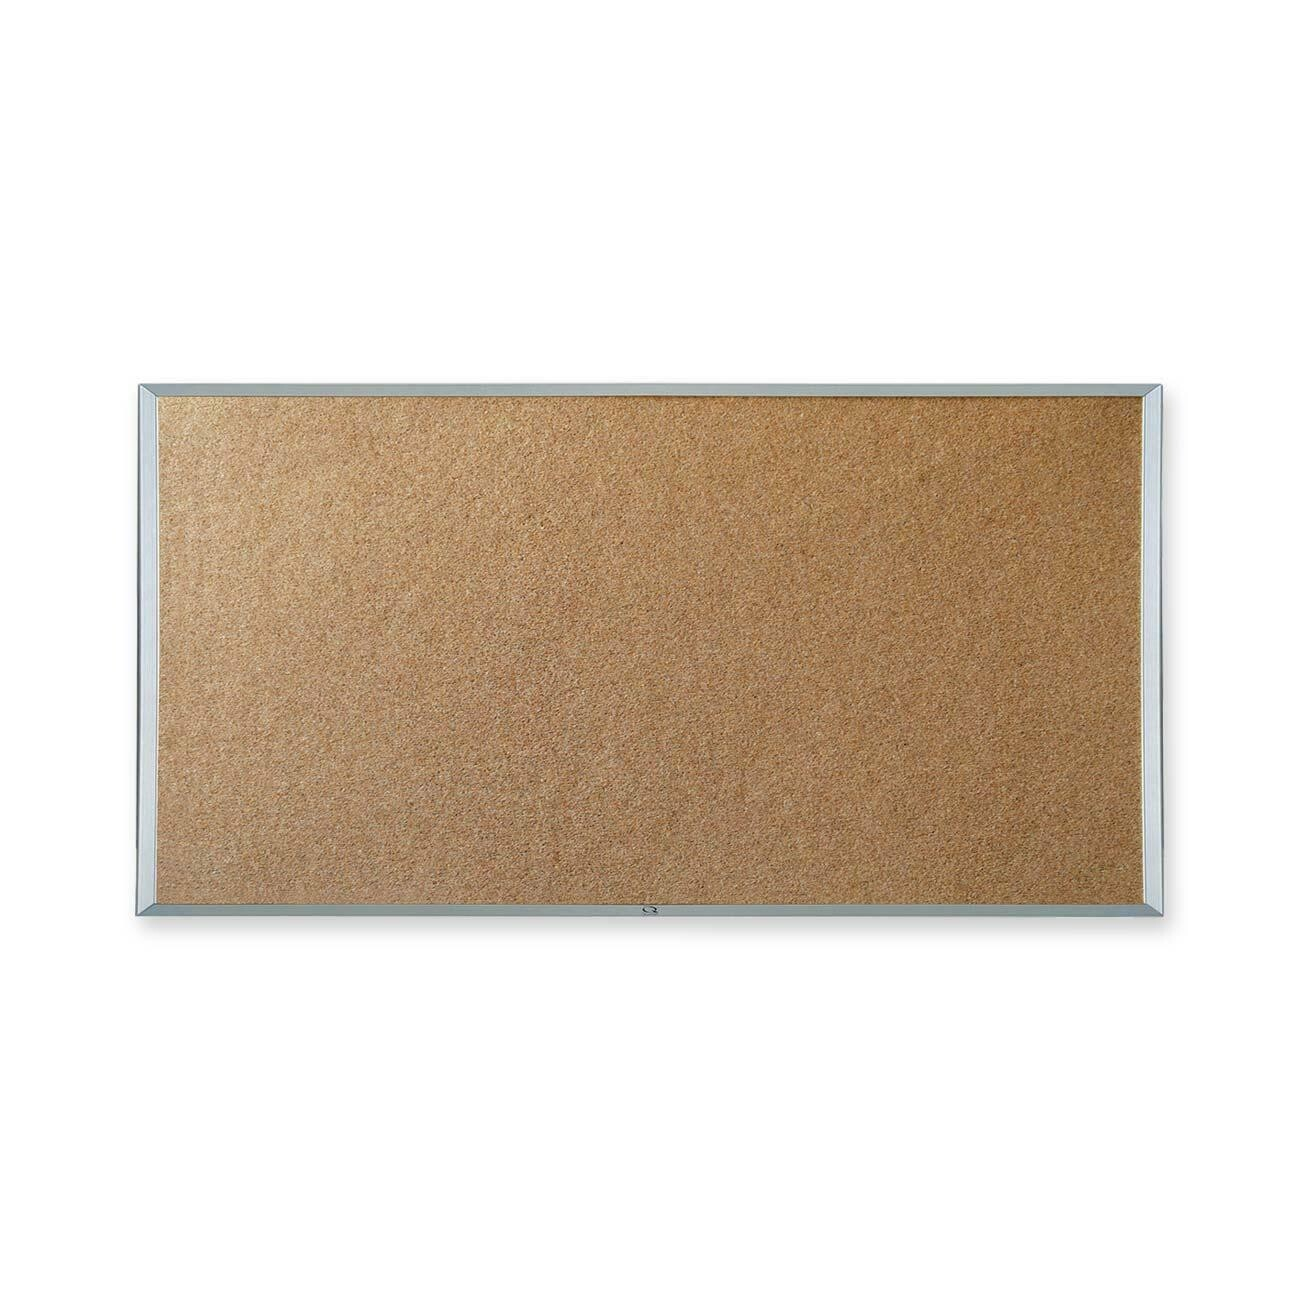 "Corkboard, 24"" x 36"" Aluminum Frame, Quartet"